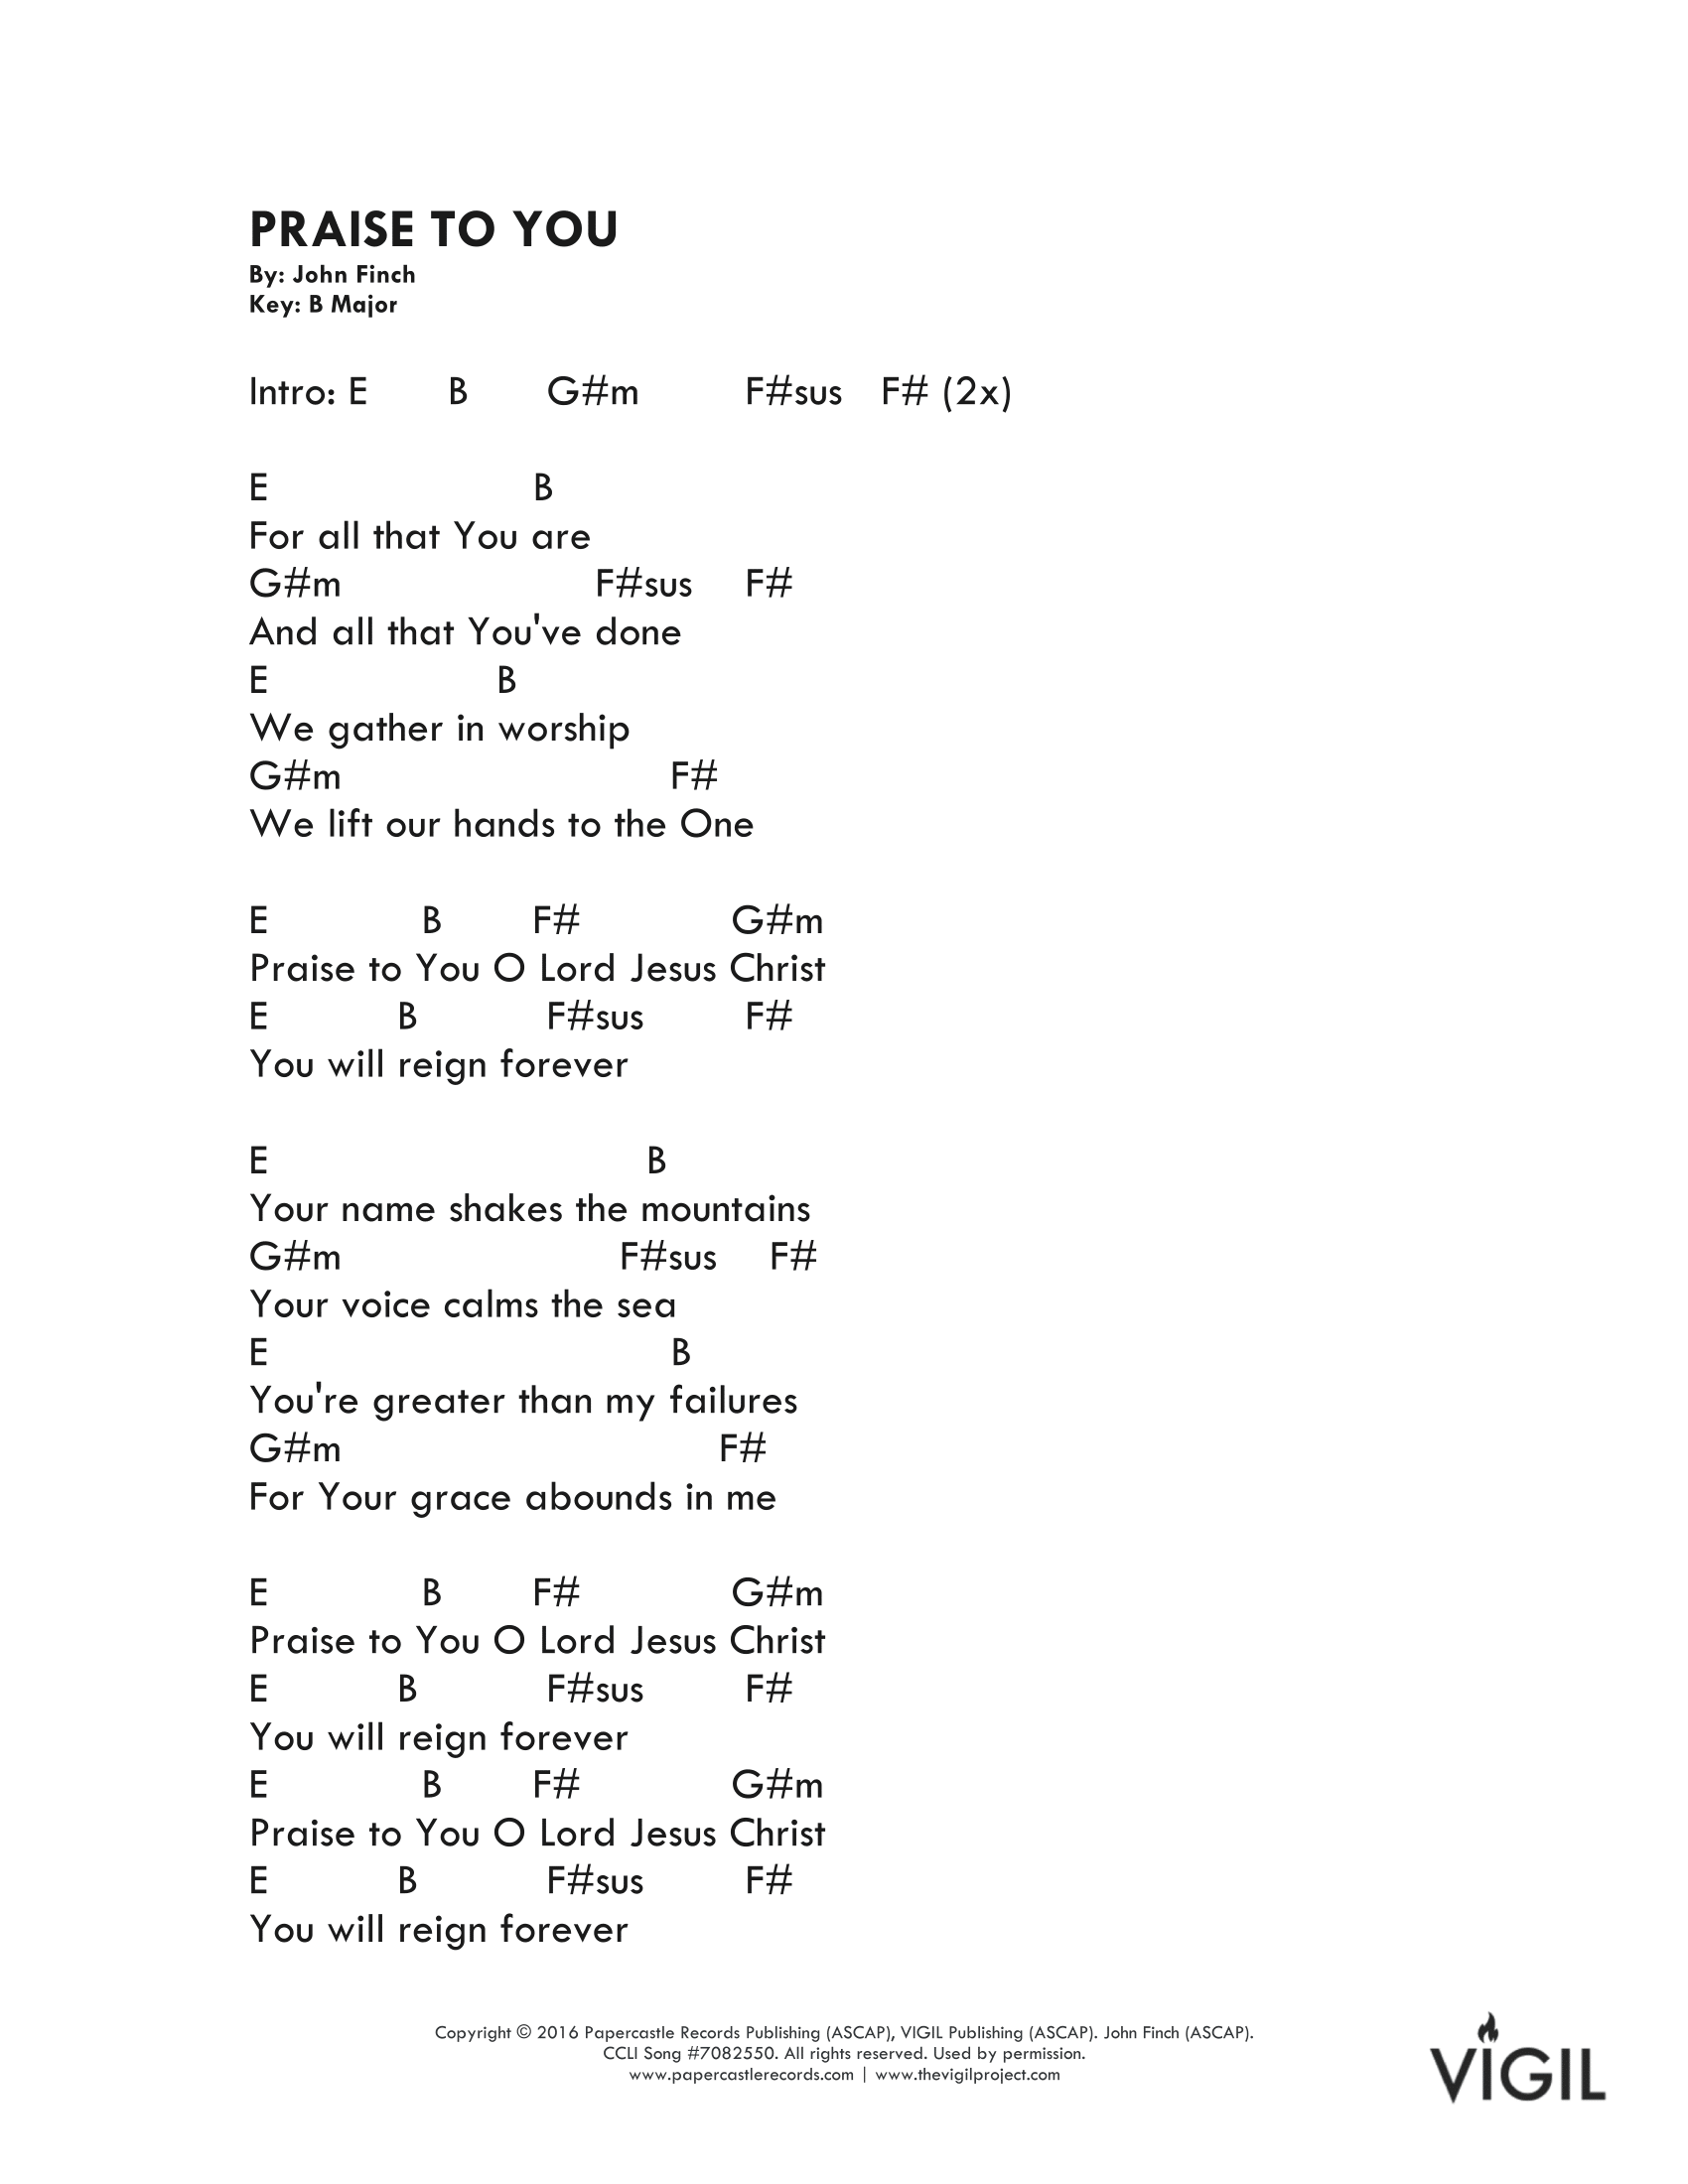 VIGIL S1 - Praise to You (B Major)-1.png